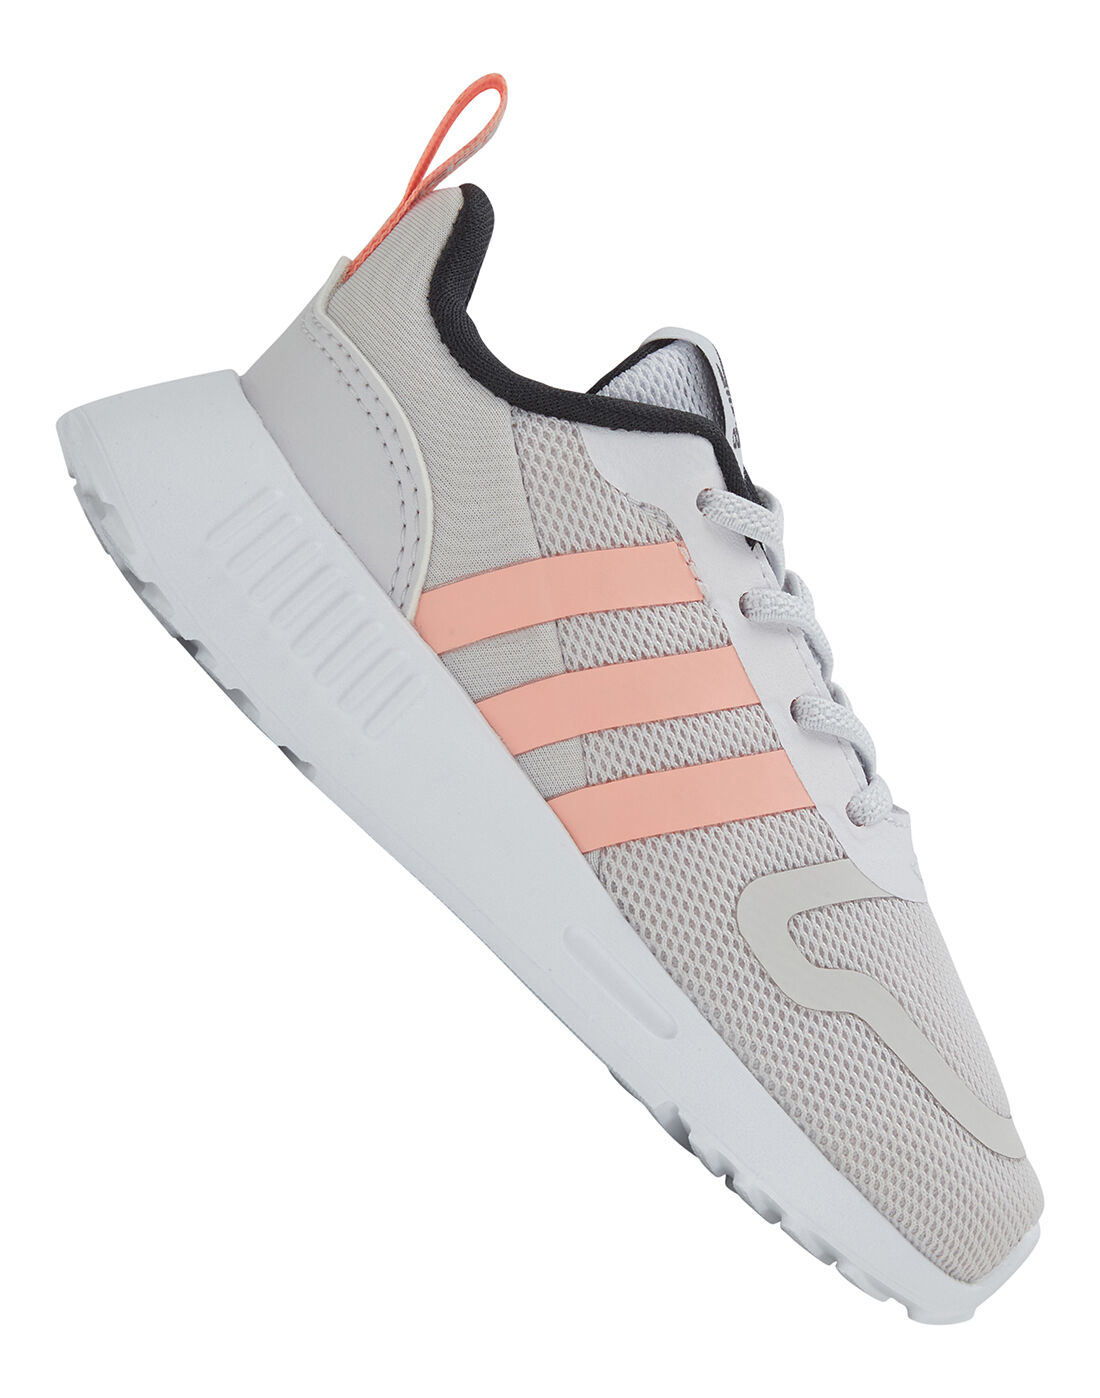 adidas Originals adidas cy9296 shoes outlet   Infant Girls Multix